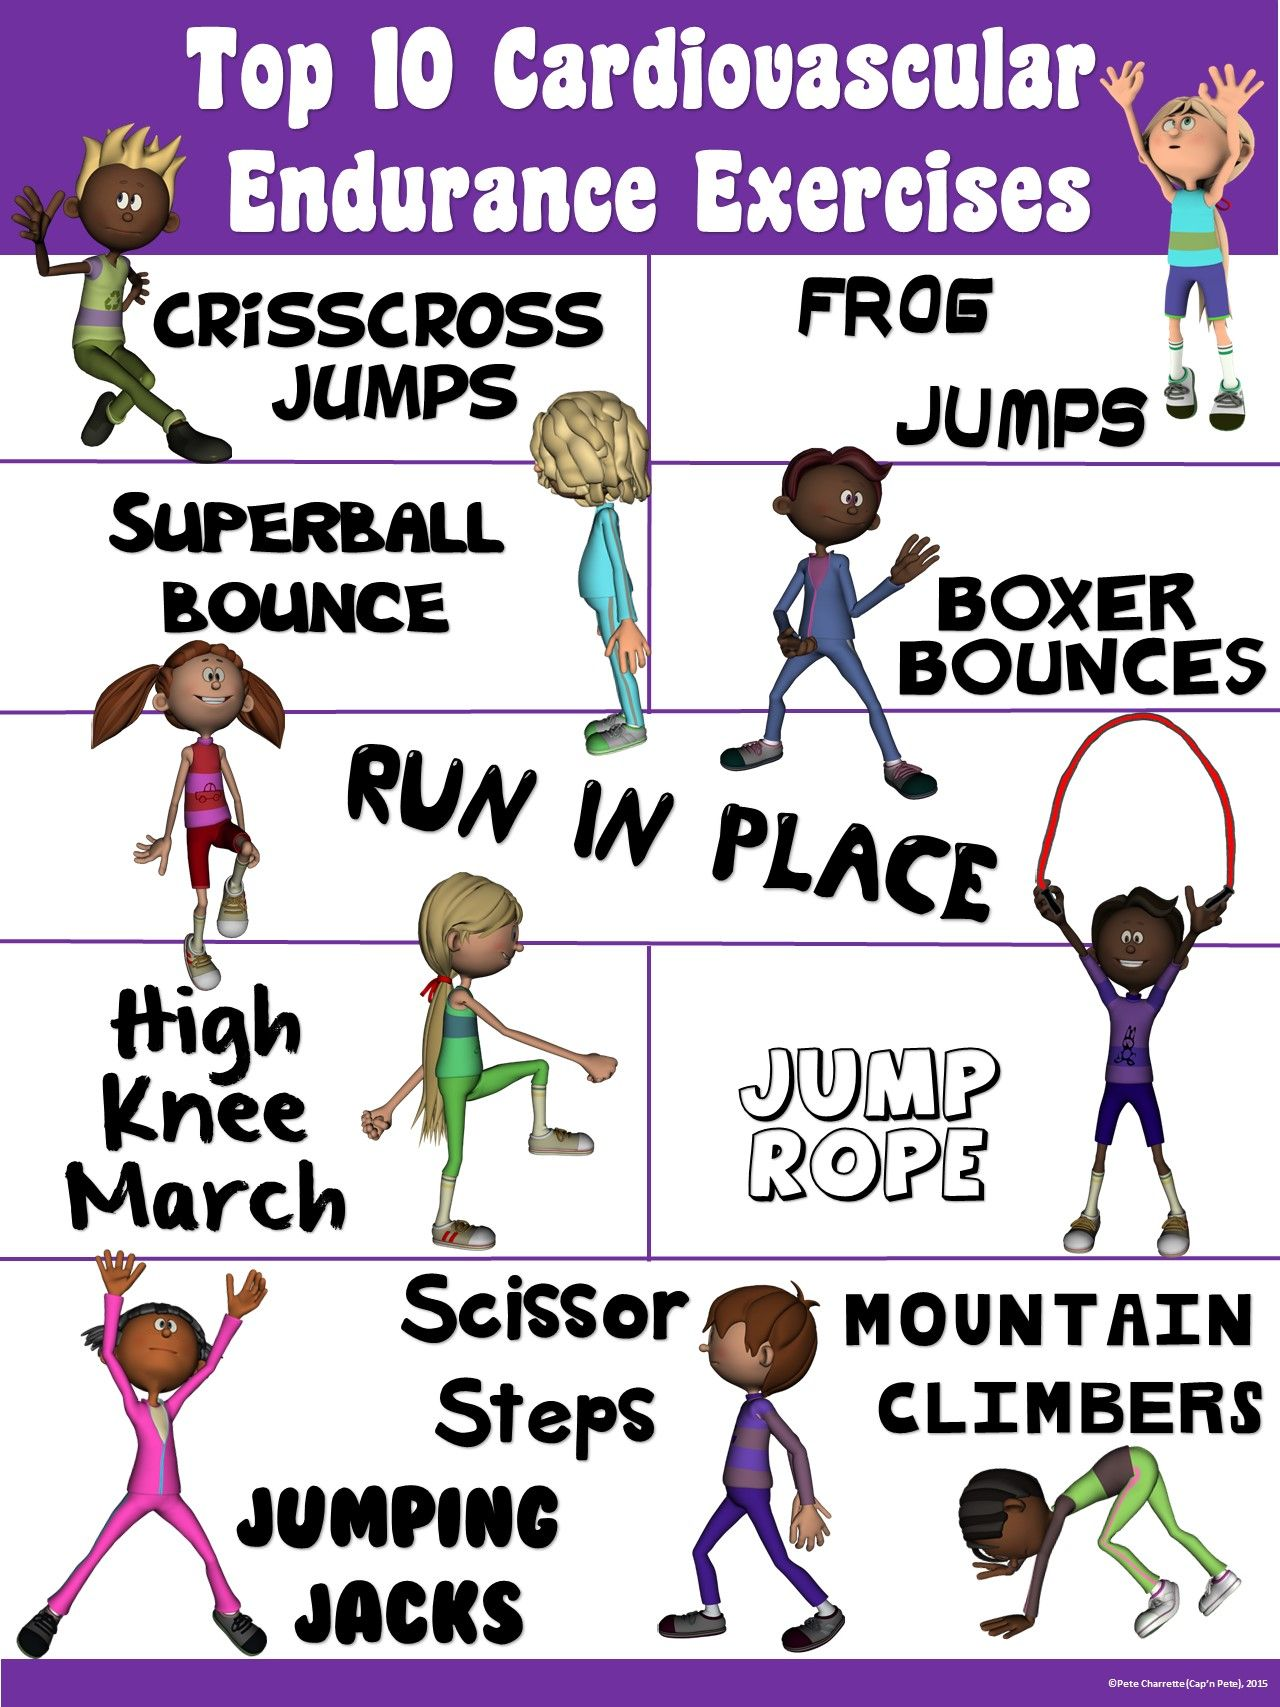 Pe Poster Top 10 Cardiovascular Endurance Exercises